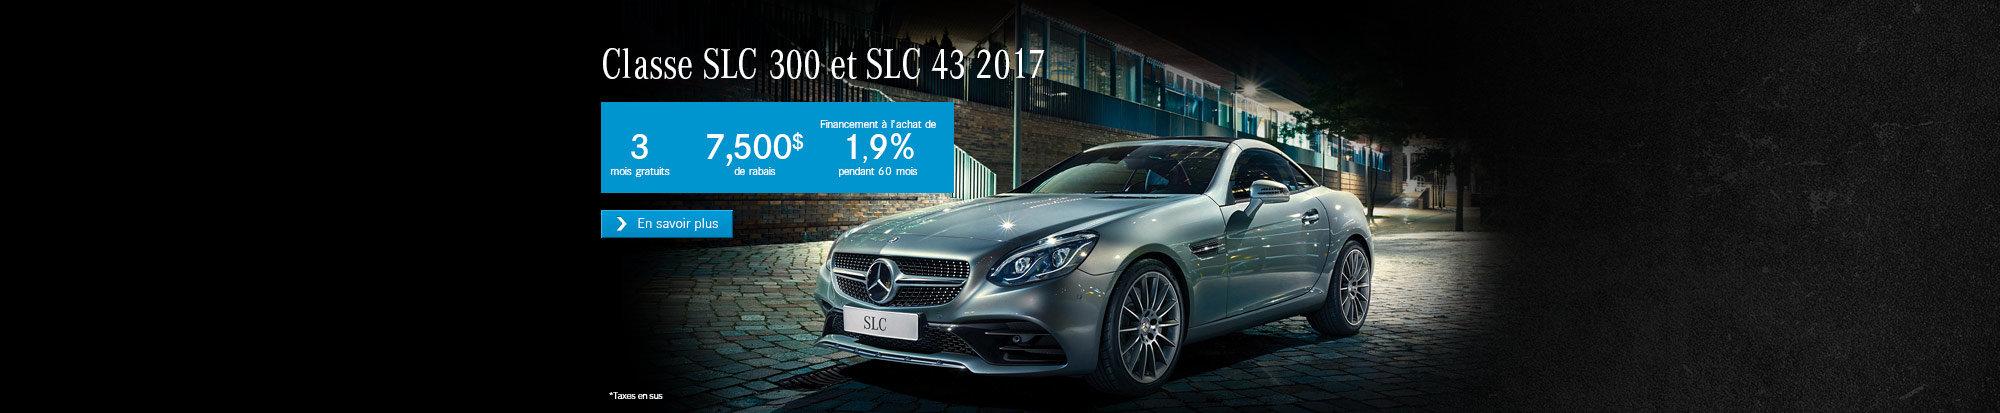 Classe SLC - Promo Septembre